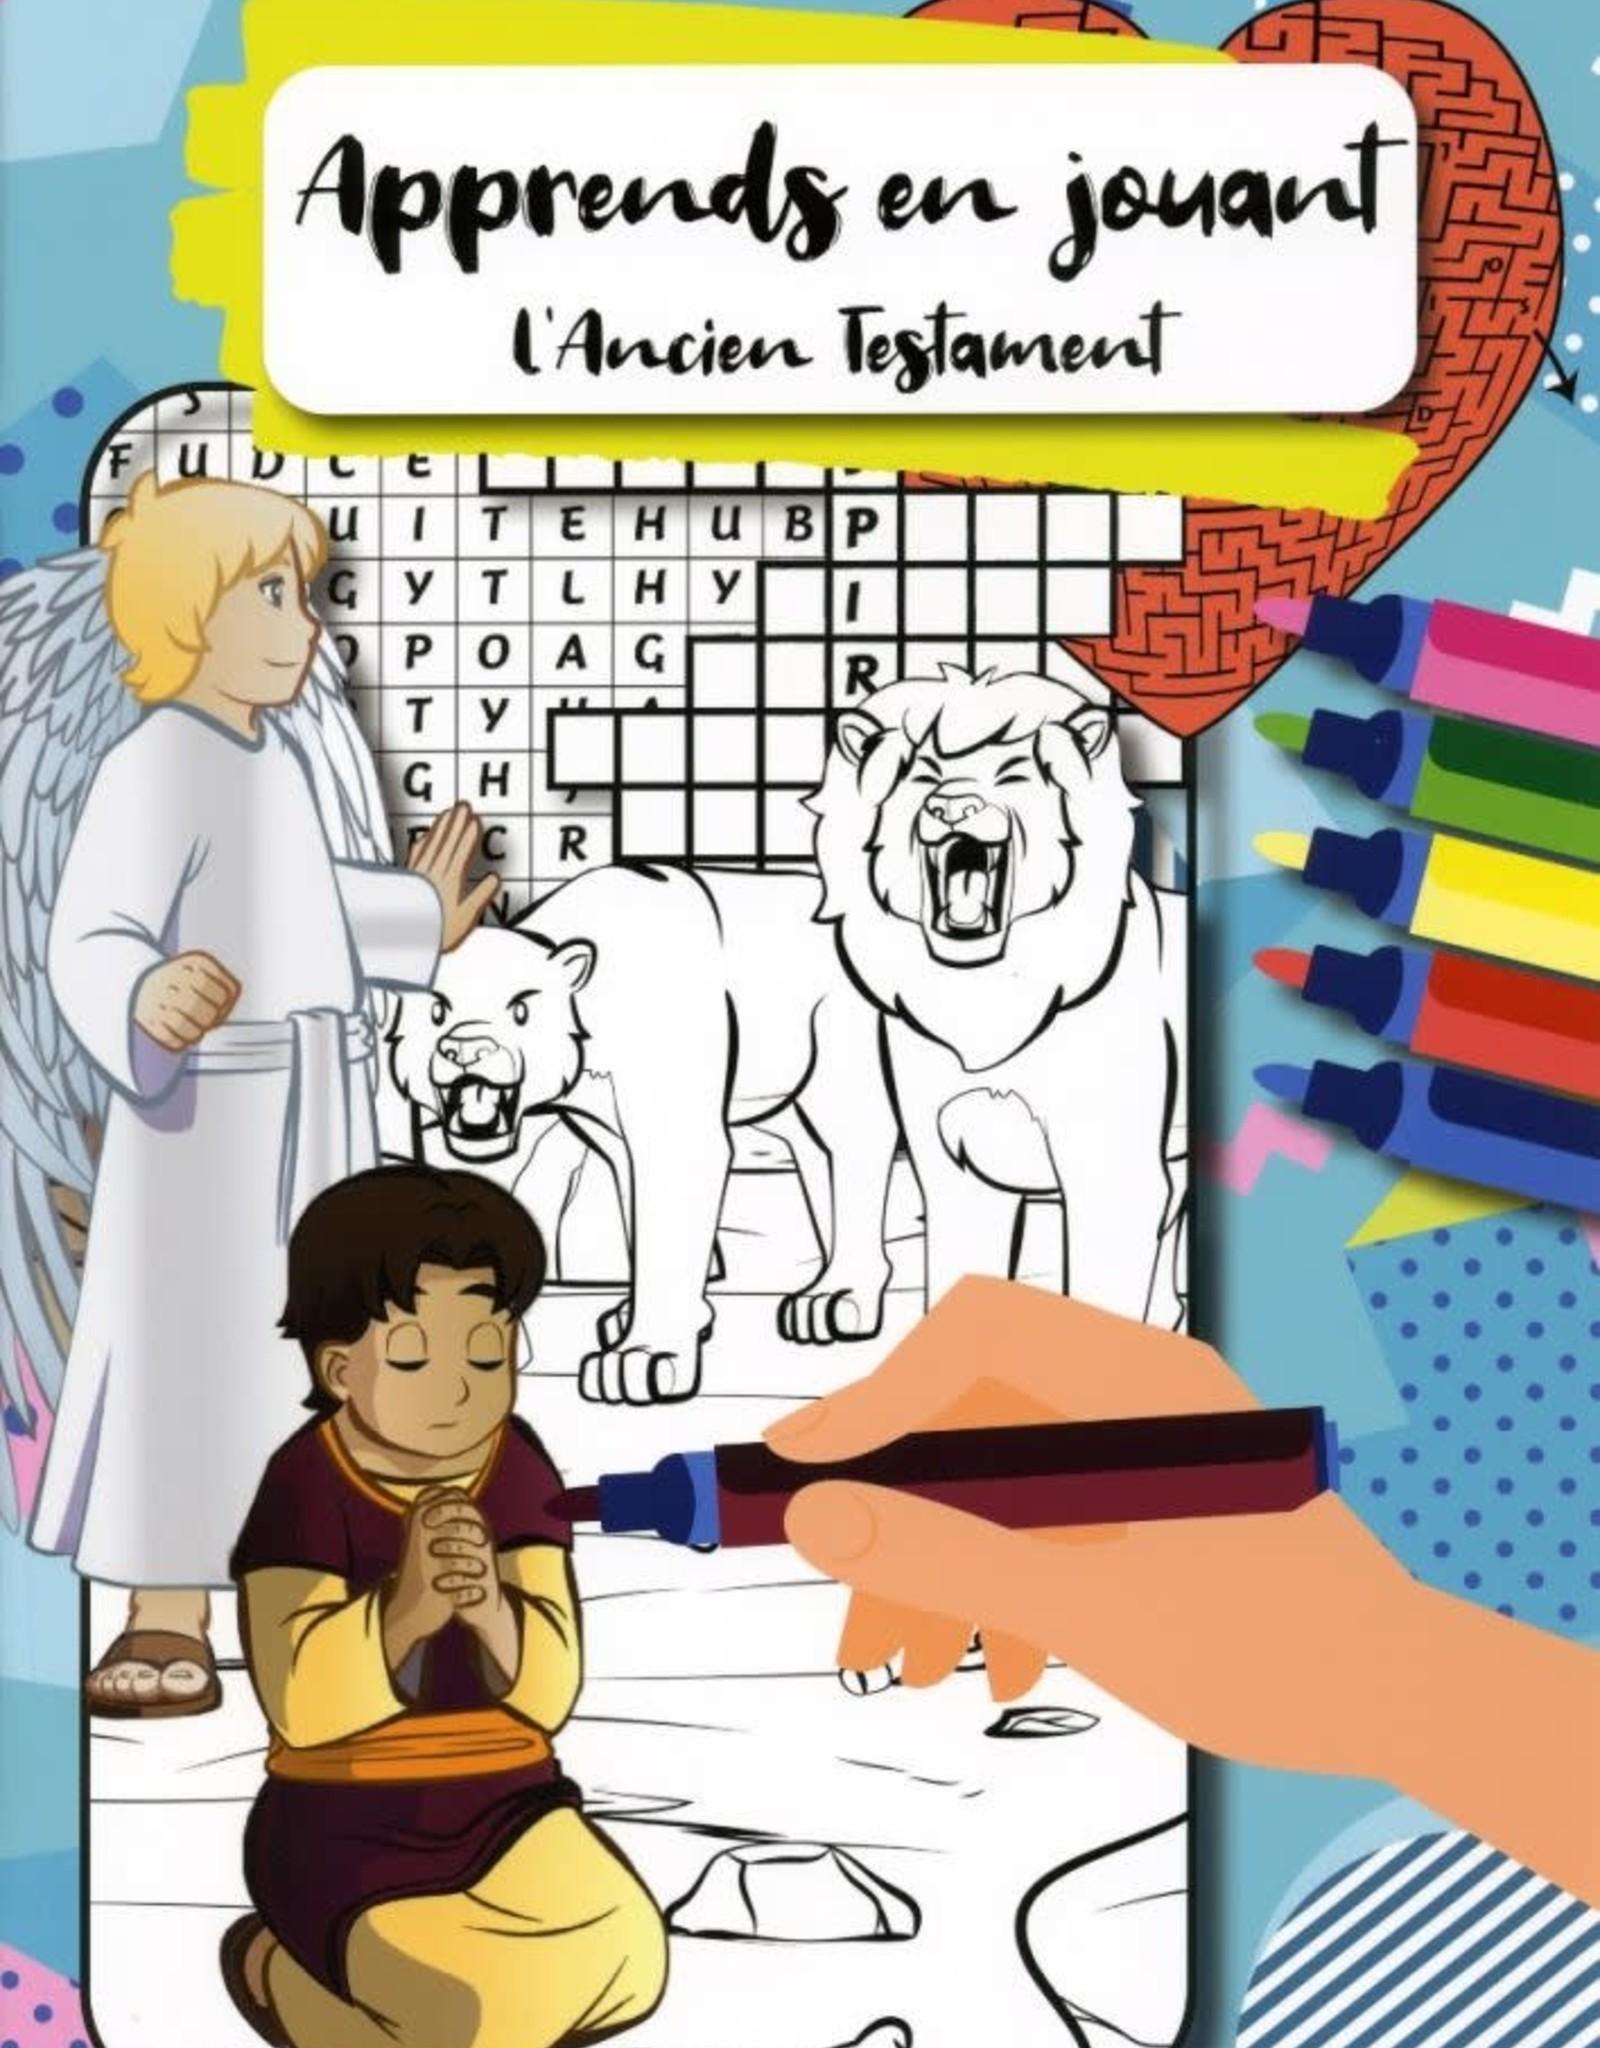 Safeliz Apprends en jouant - Ancient Testament